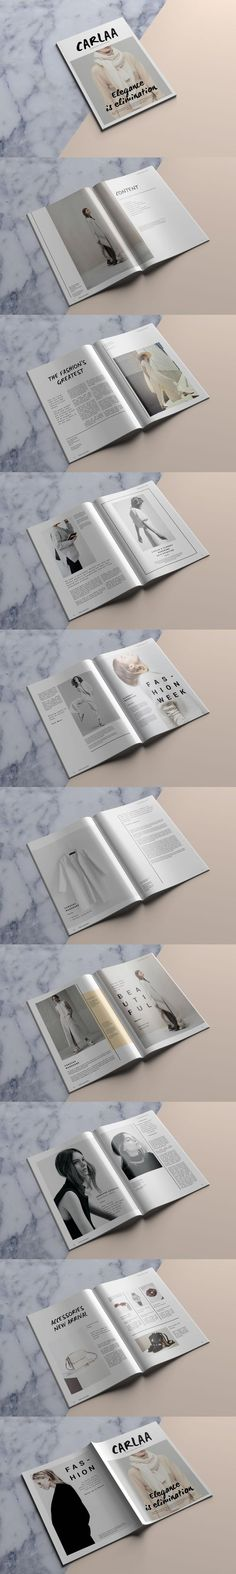 #magazine #design from Kingtown. Co | DOWNLOAD: https://creativemarket.com/kingtown/690628-C-A-R-L-A-A-Magazine-Template?u=zsoltczigler